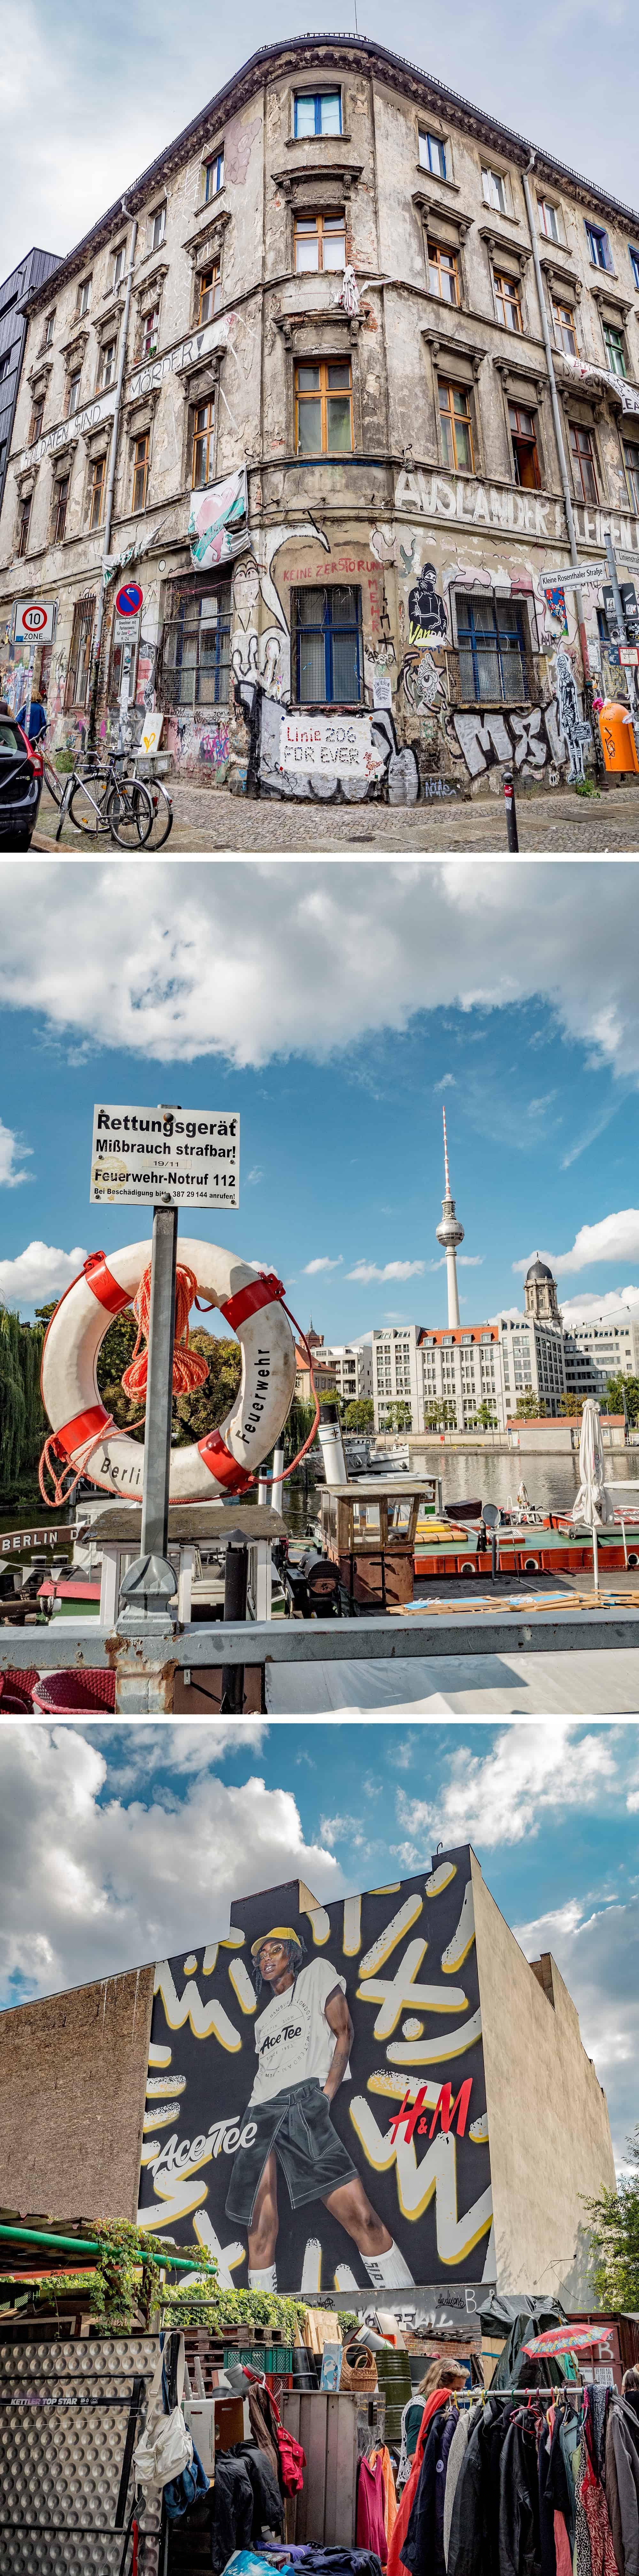 berlin sunny day